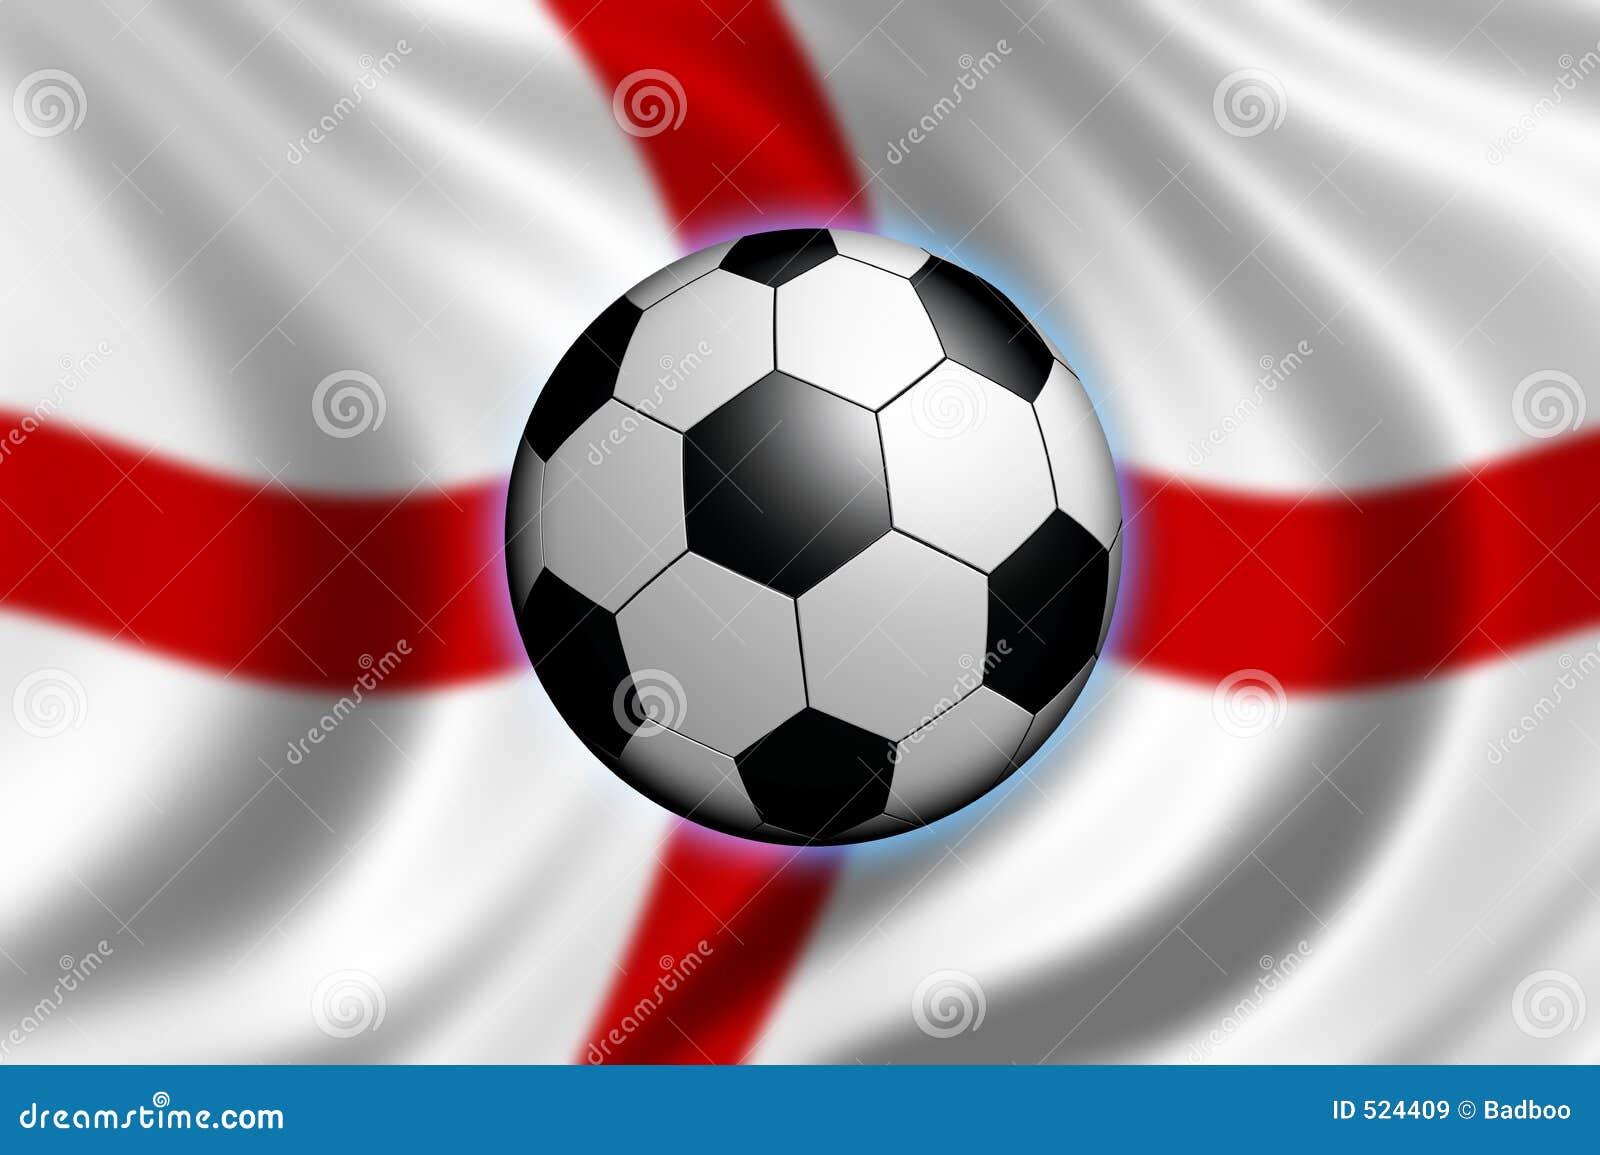 Fussball In England Stock Abbildung Illustration Von Starke